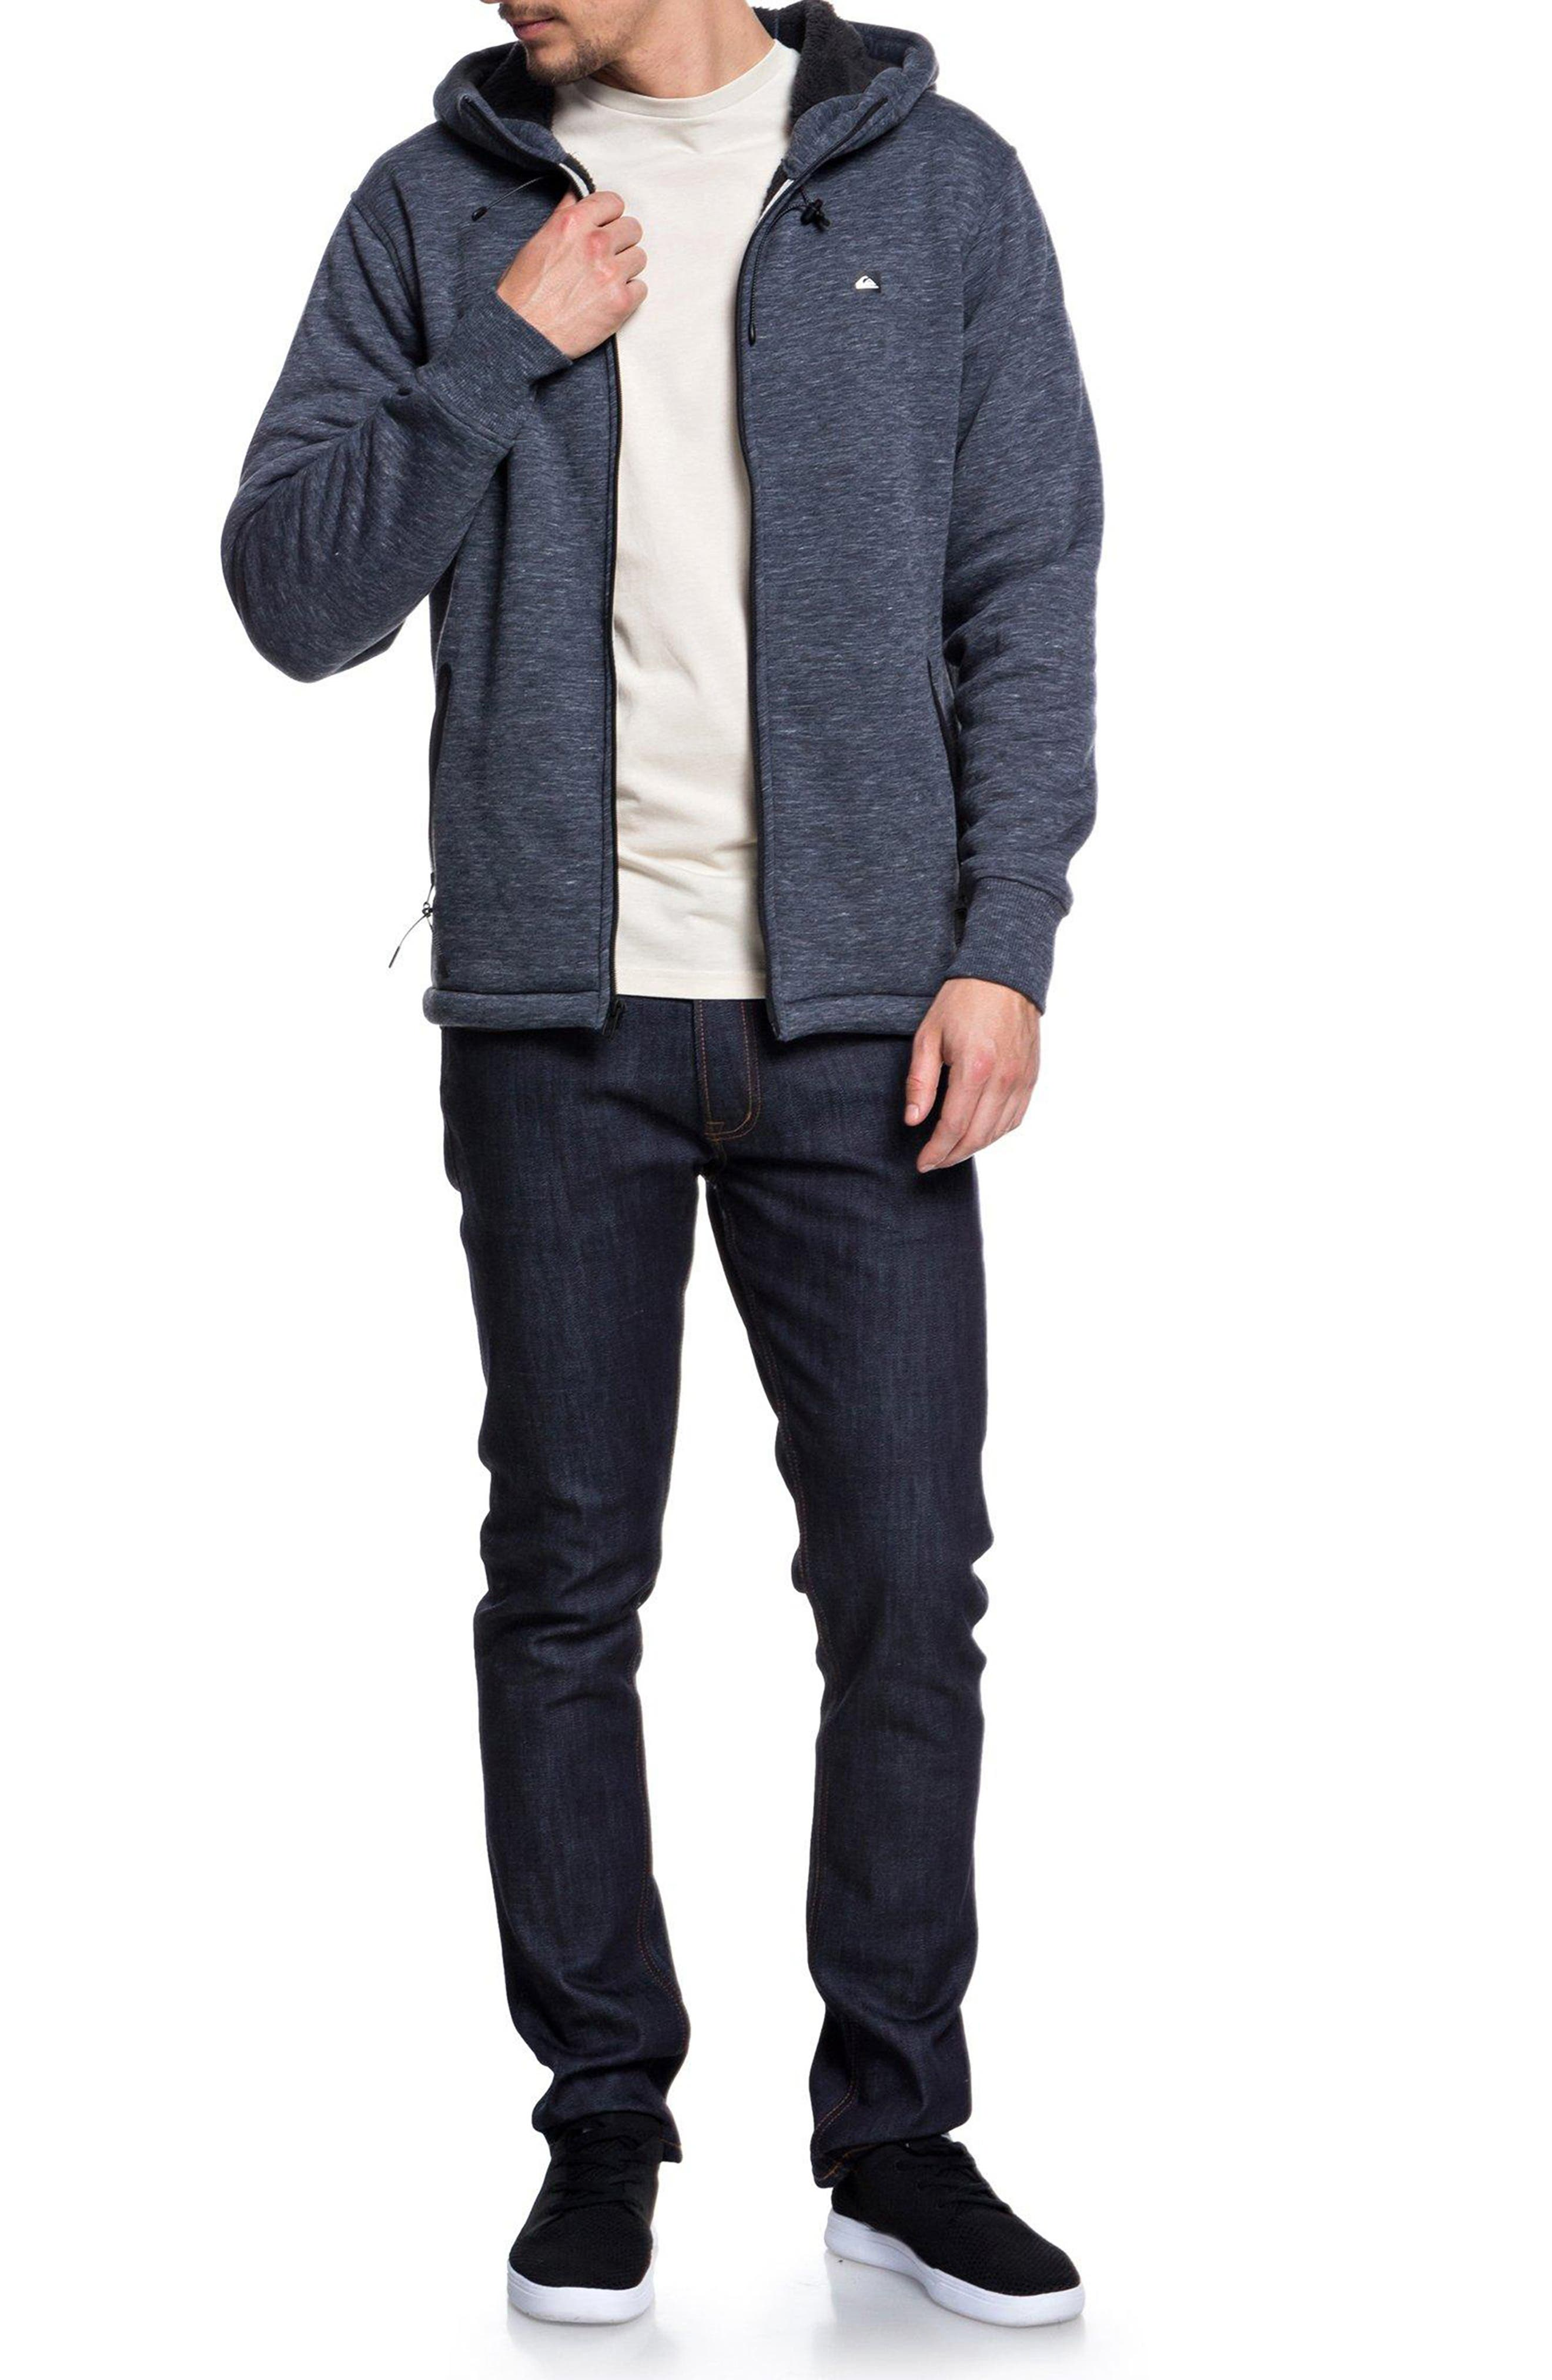 Kurow Fleece Hooded Jacket,                             Alternate thumbnail 3, color,                             BLUE NIGHTS HEATHER